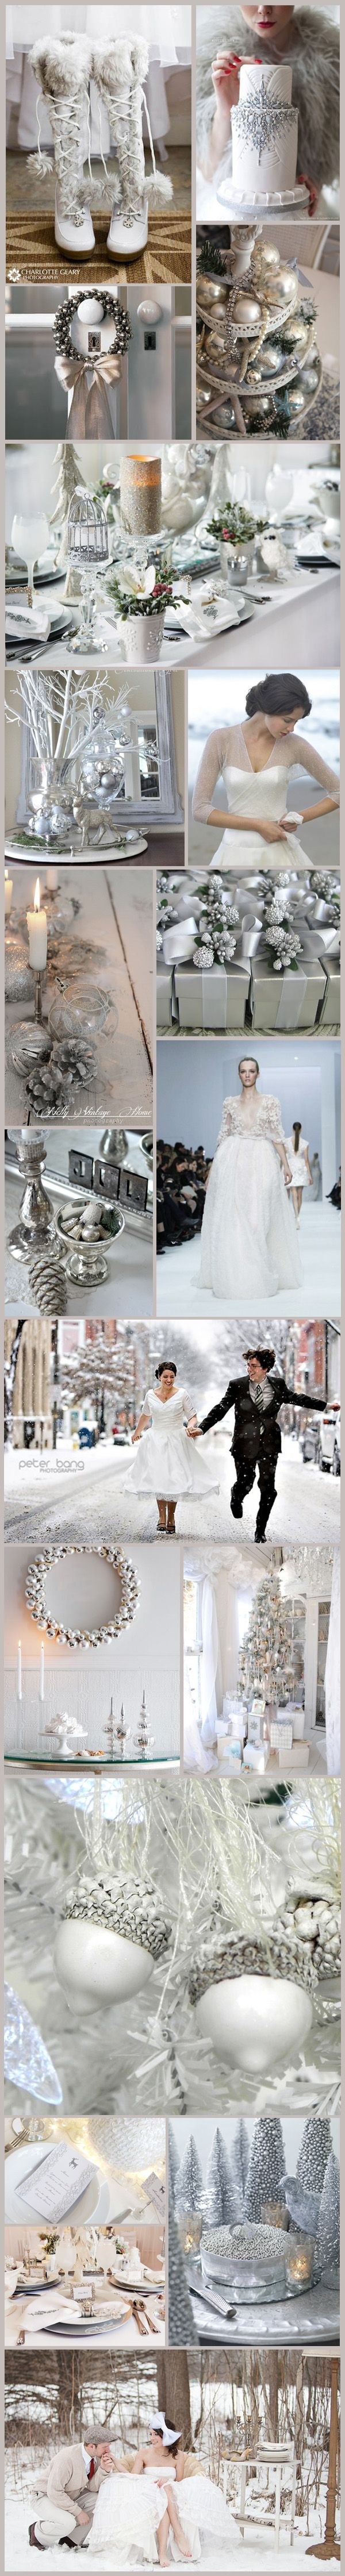 Wednesday Wedding Inspiration: Silver Christmas & Winter – Bespoke-Bride: Wedding Blog